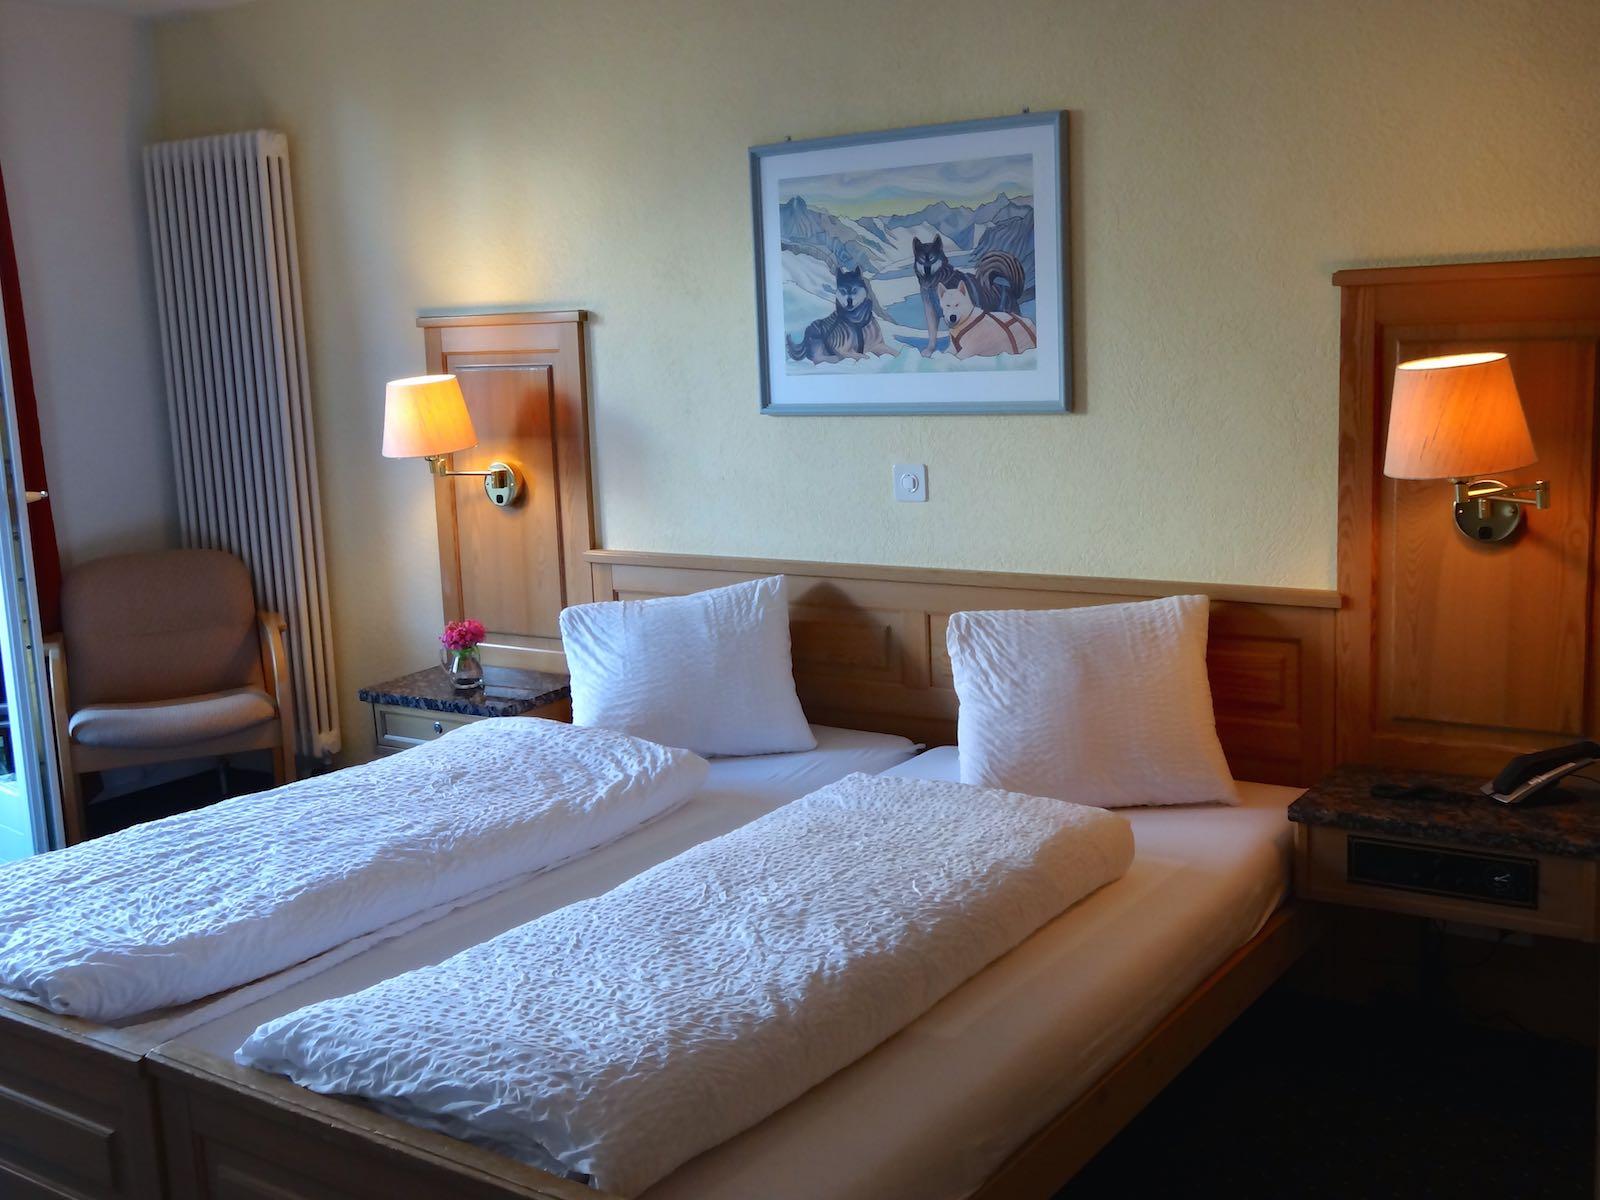 http://hoteljungfrau.ch/wp-content/uploads/2014/11/superior-zimmer-7.jpg